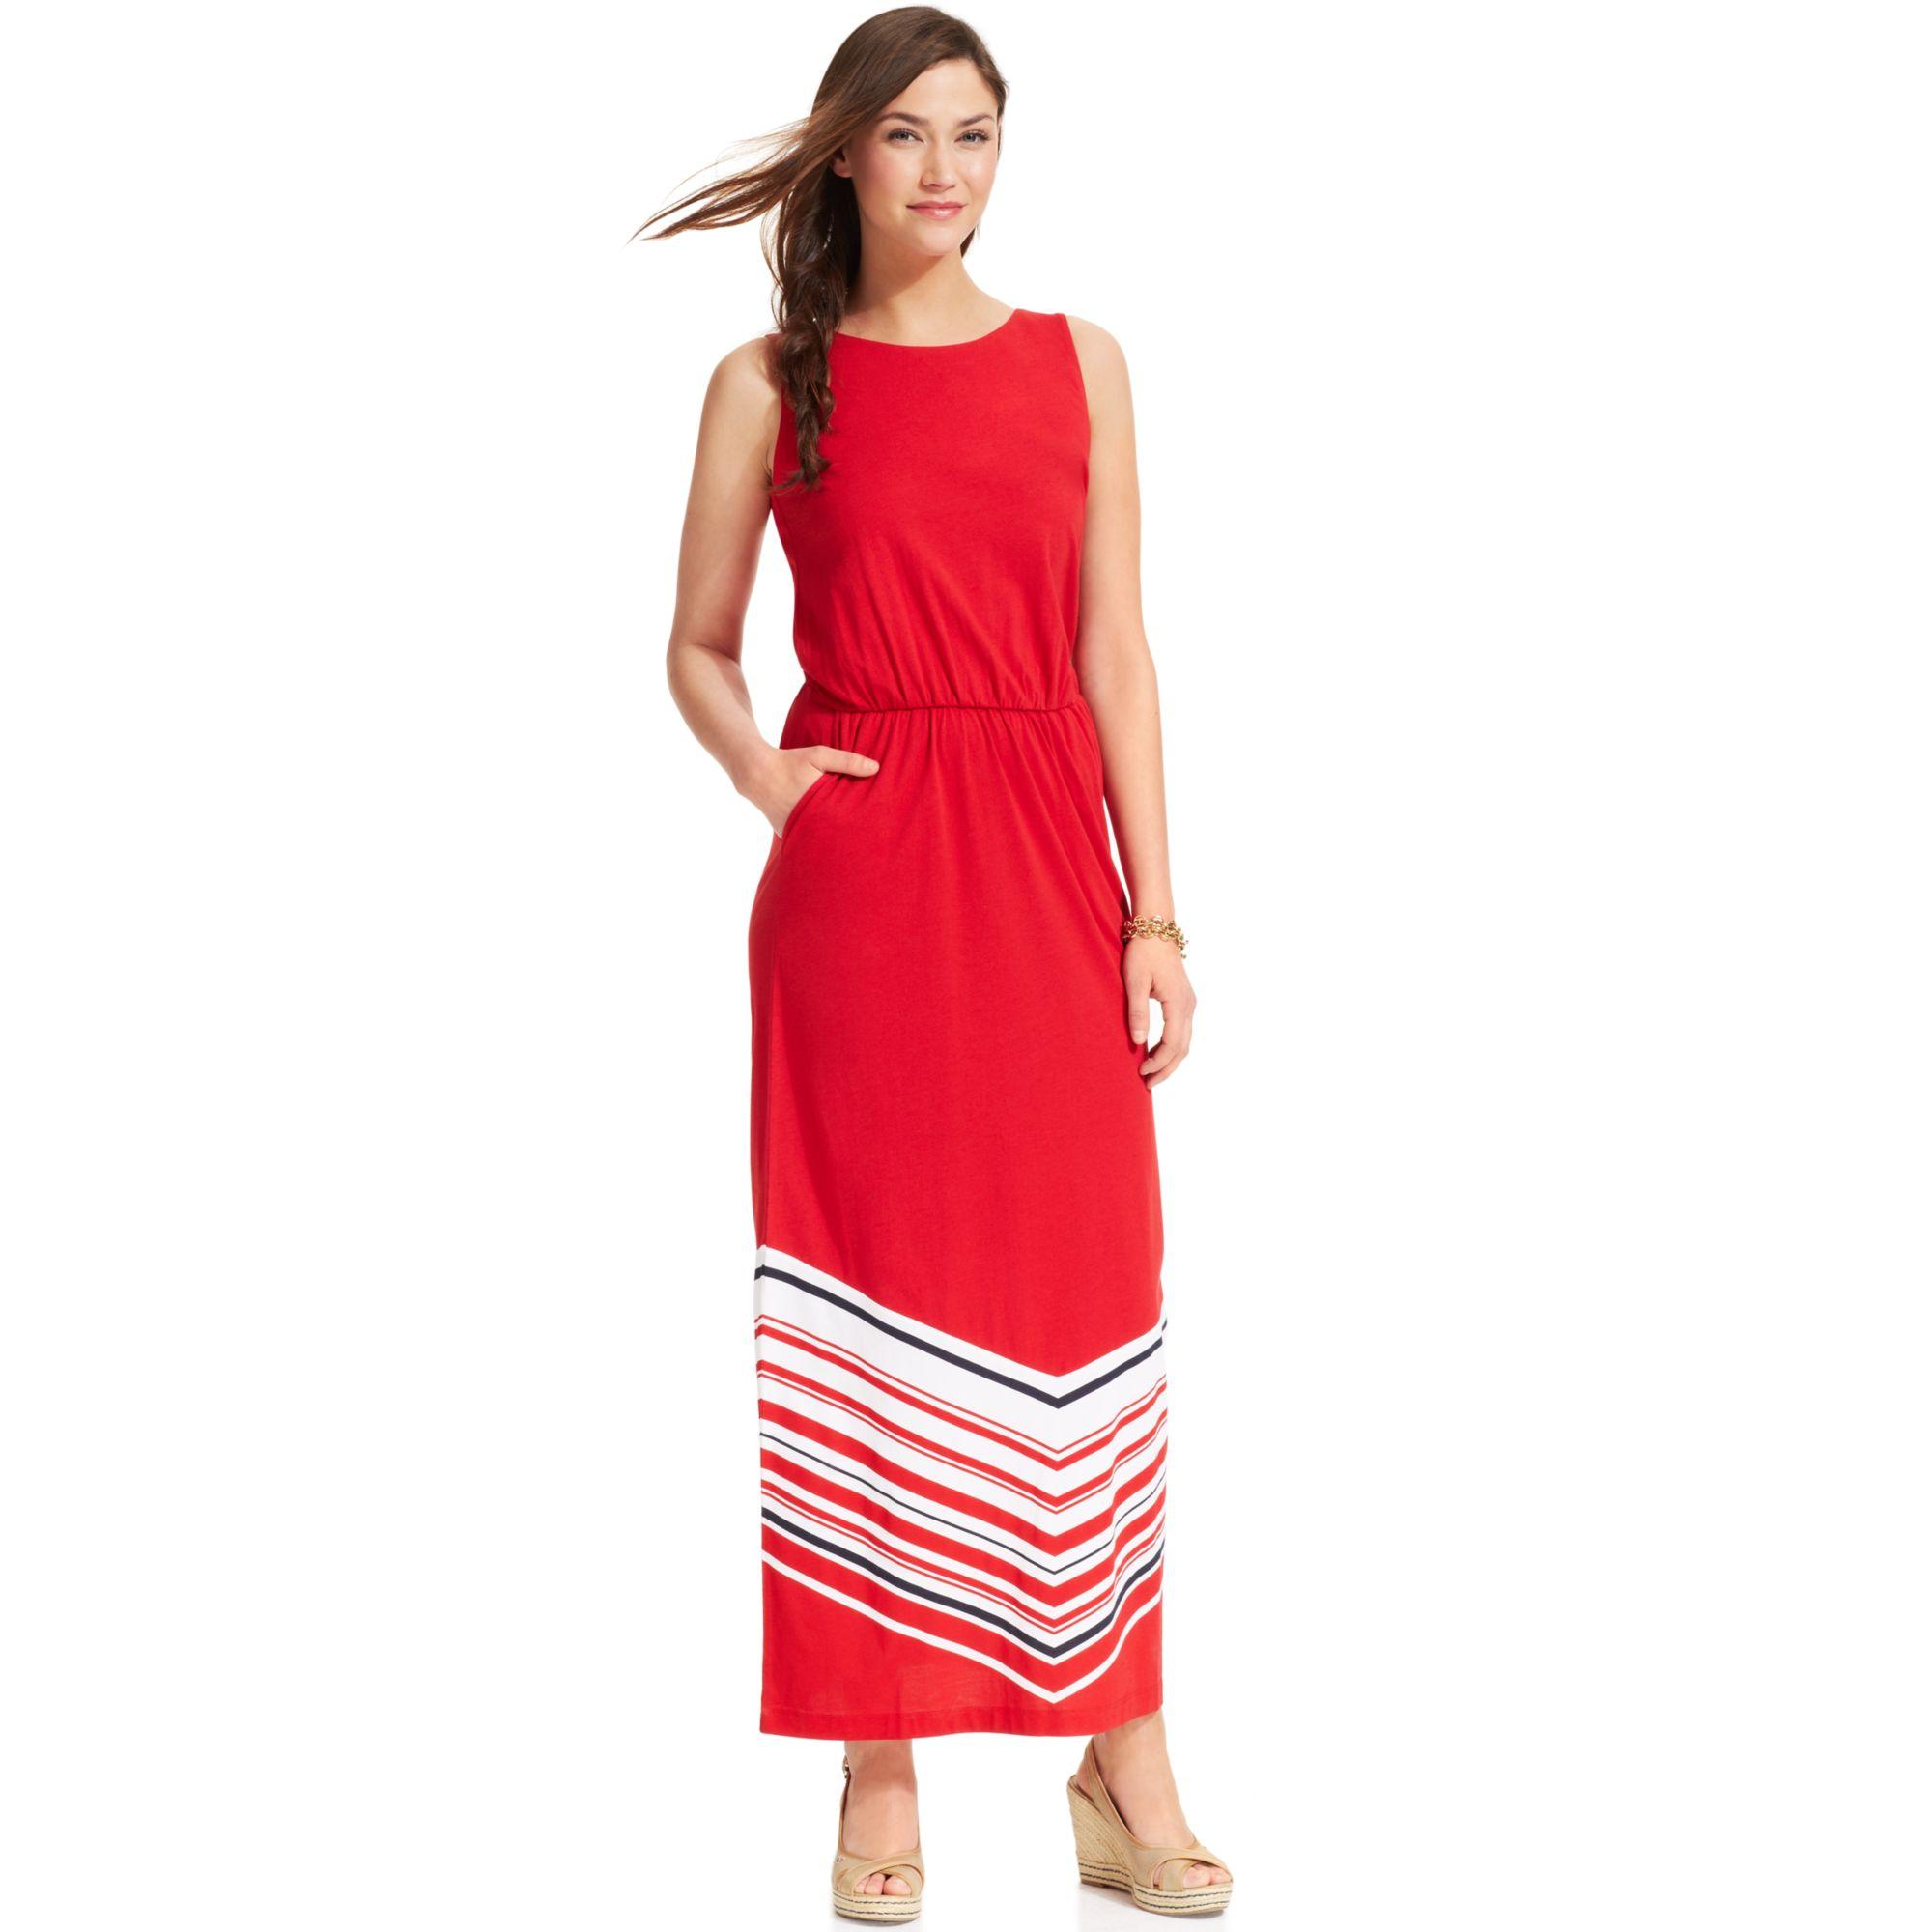 Lyst - Tommy Hilfiger Sleeveless Chevronprint Maxi Dress in Red